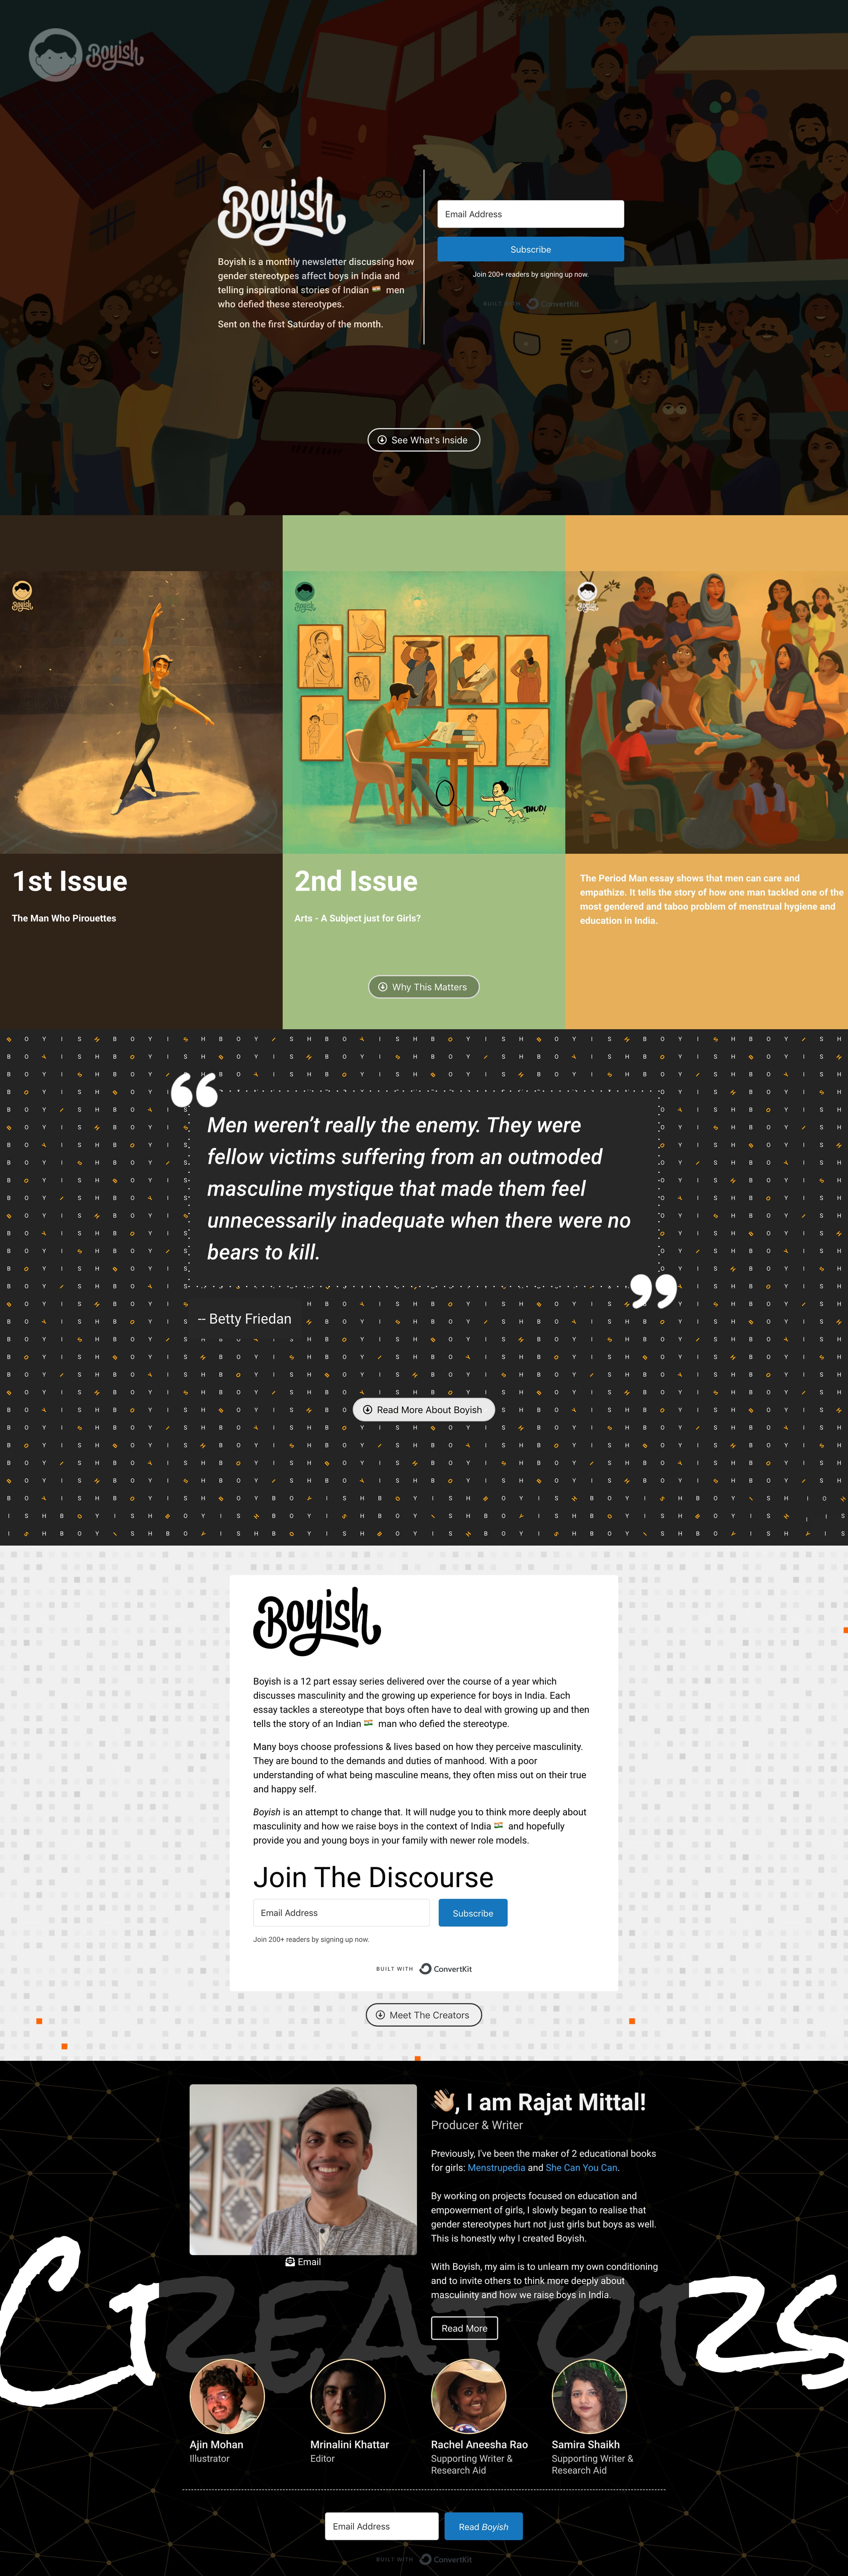 Boyish Website Screenshot